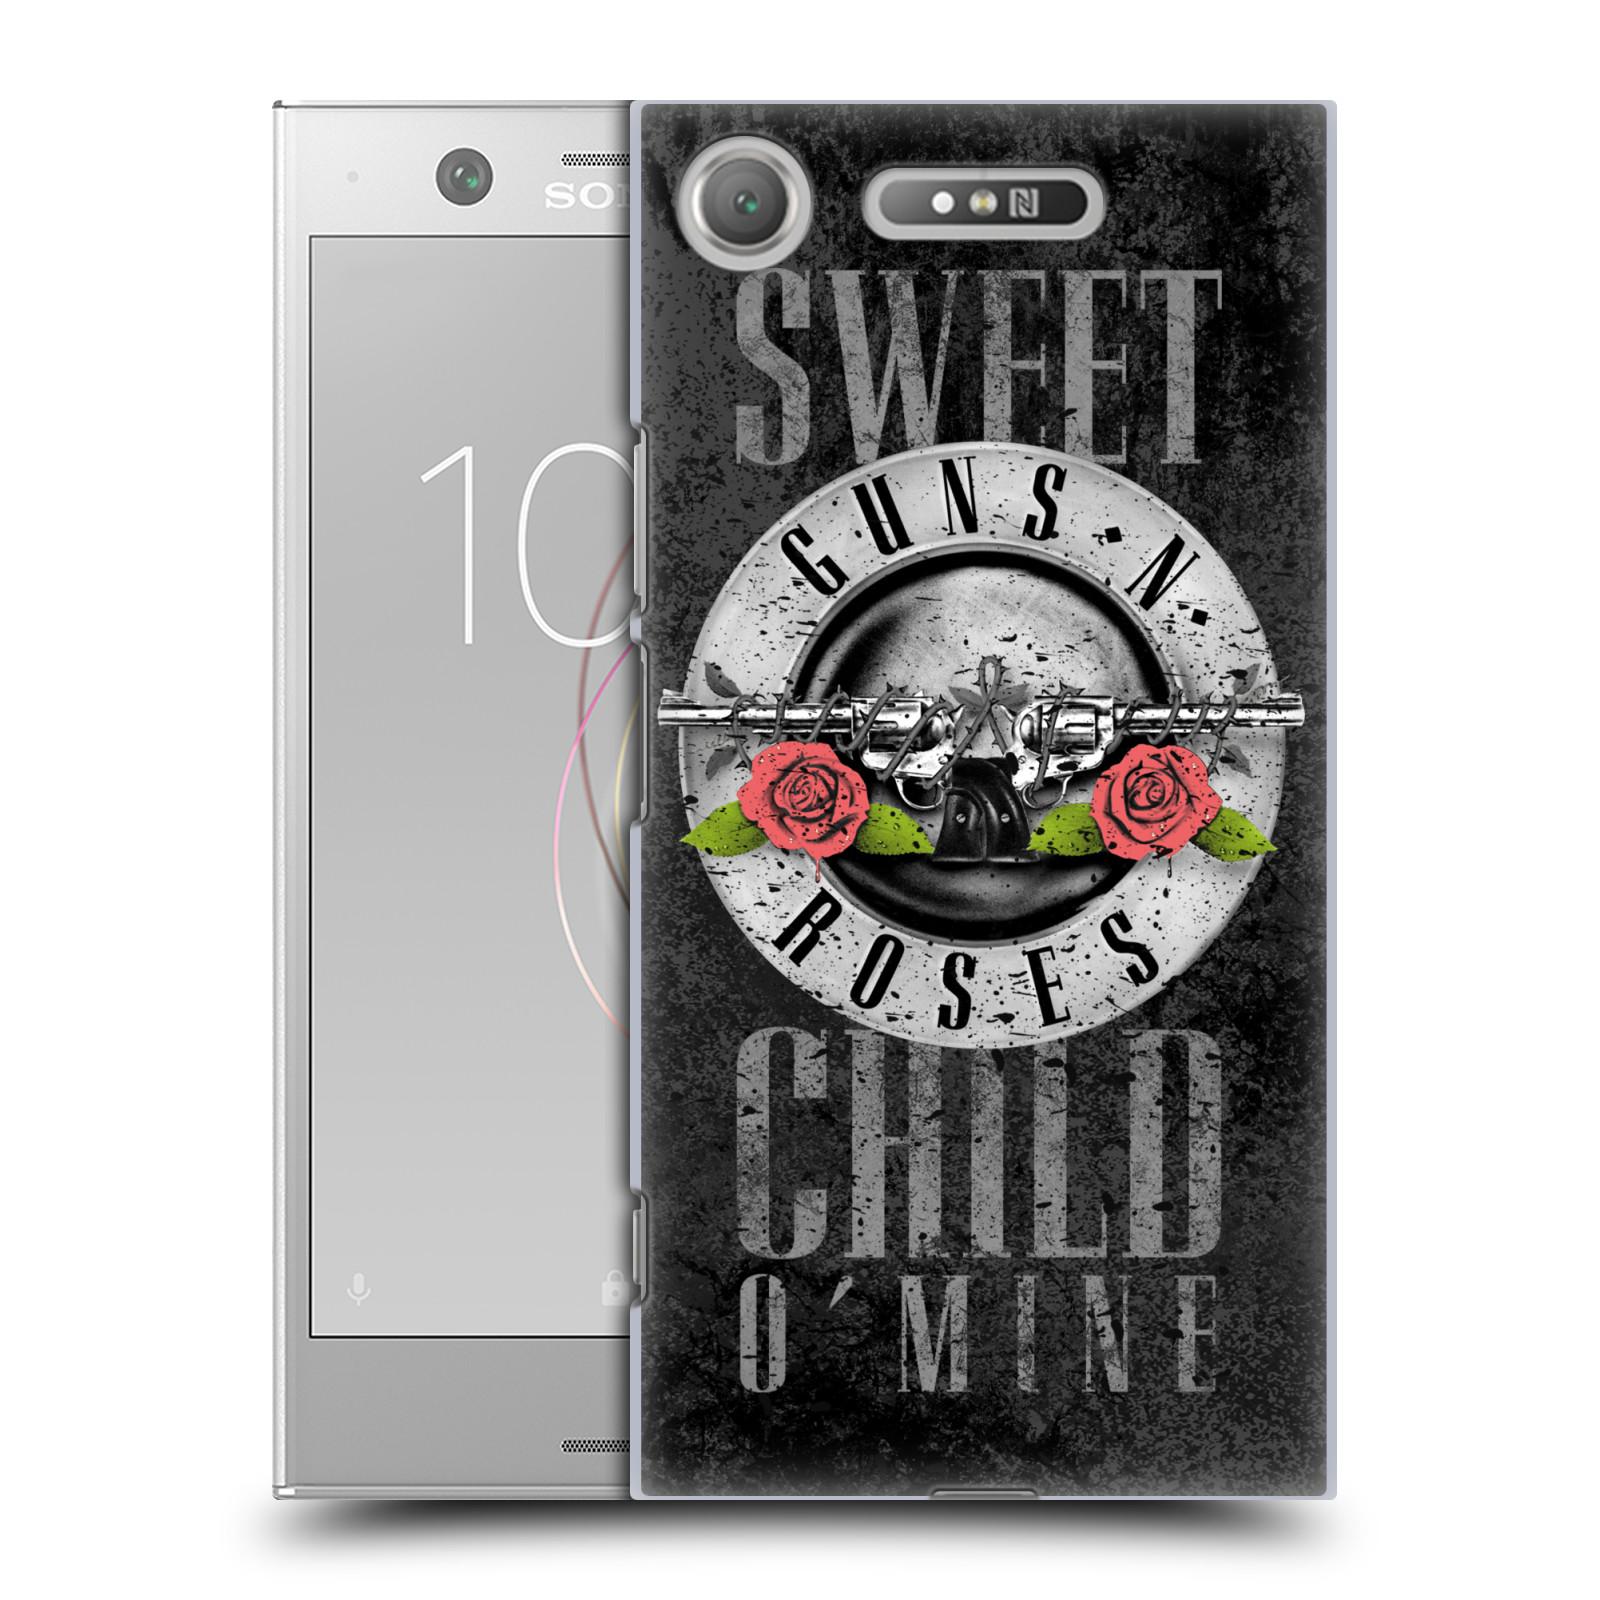 Plastové pouzdro na mobil Sony Xperia XZ1 - Head Case - Guns N' Roses - Sweet Child